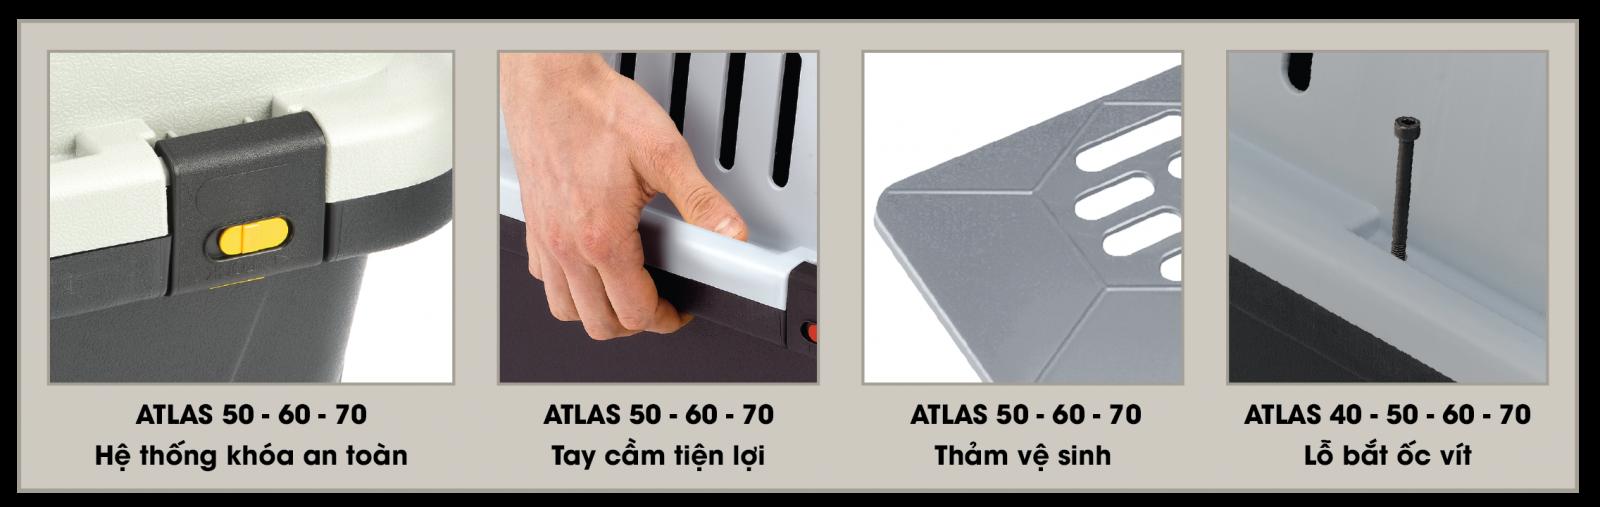 Lồng vận chuyển Ferplast Atlas Professional 60 (91x61x67cm)